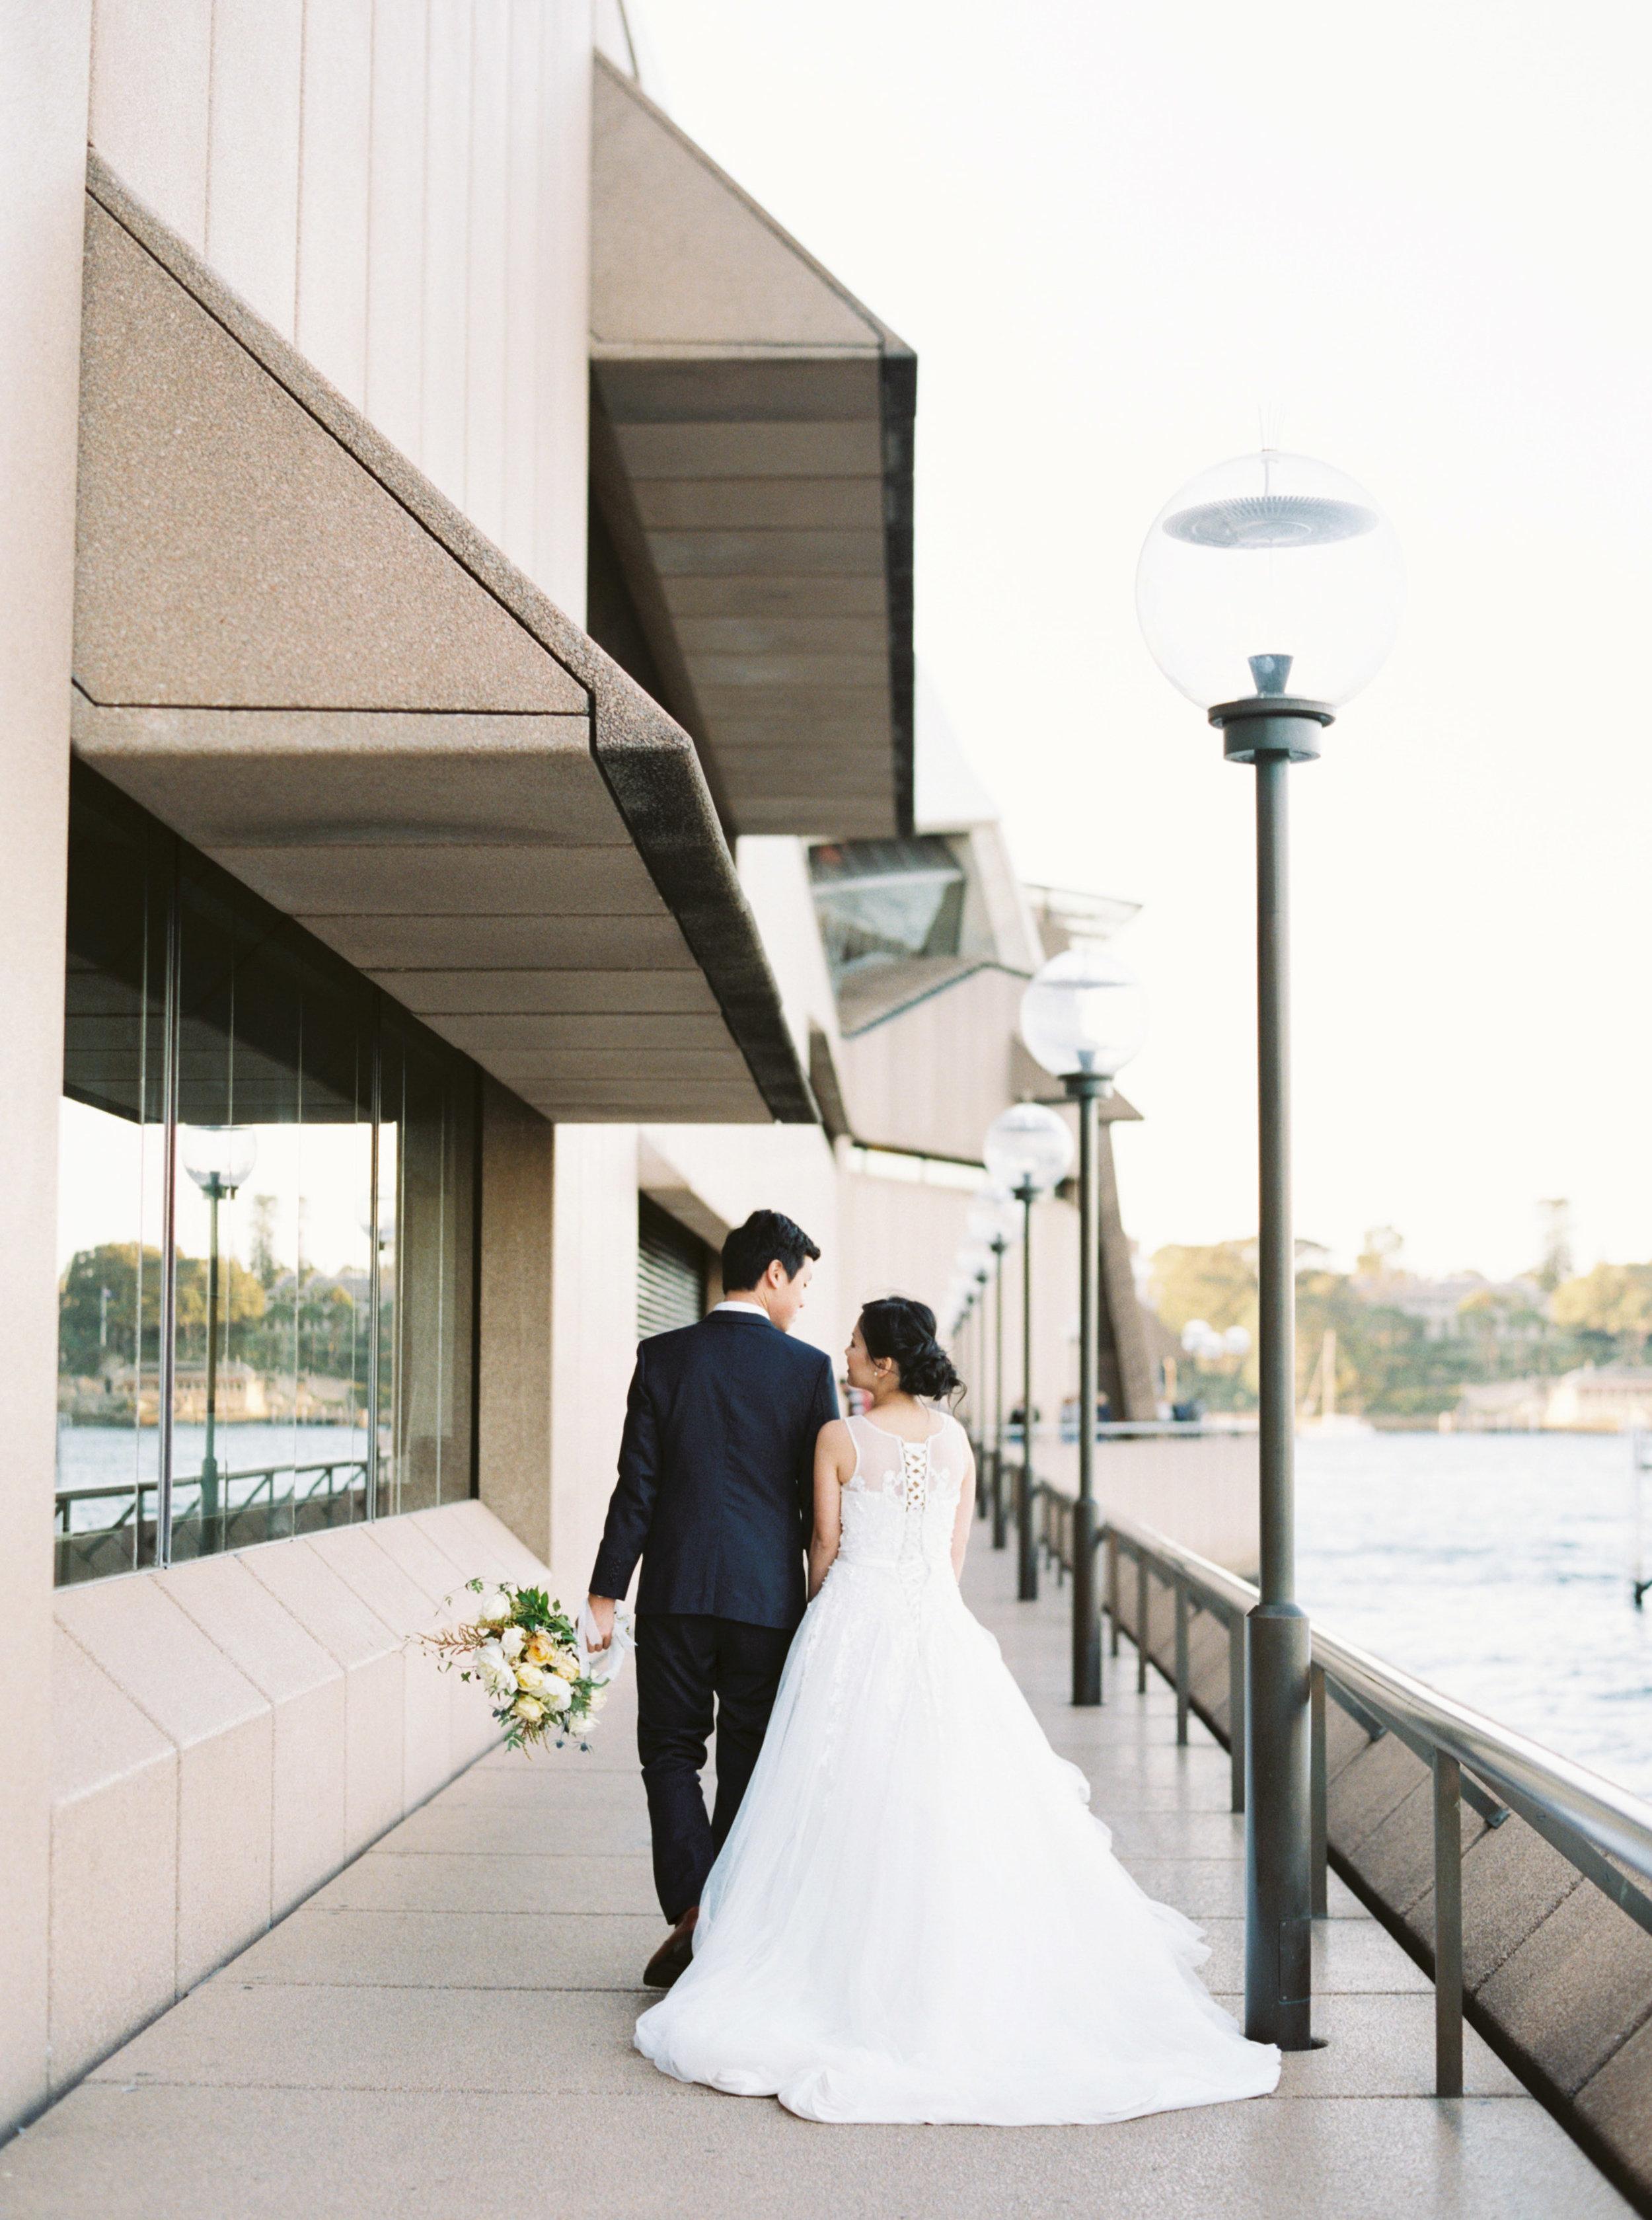 00033- Australia Sydney Wedding Photographer Sheri McMahon.jpg